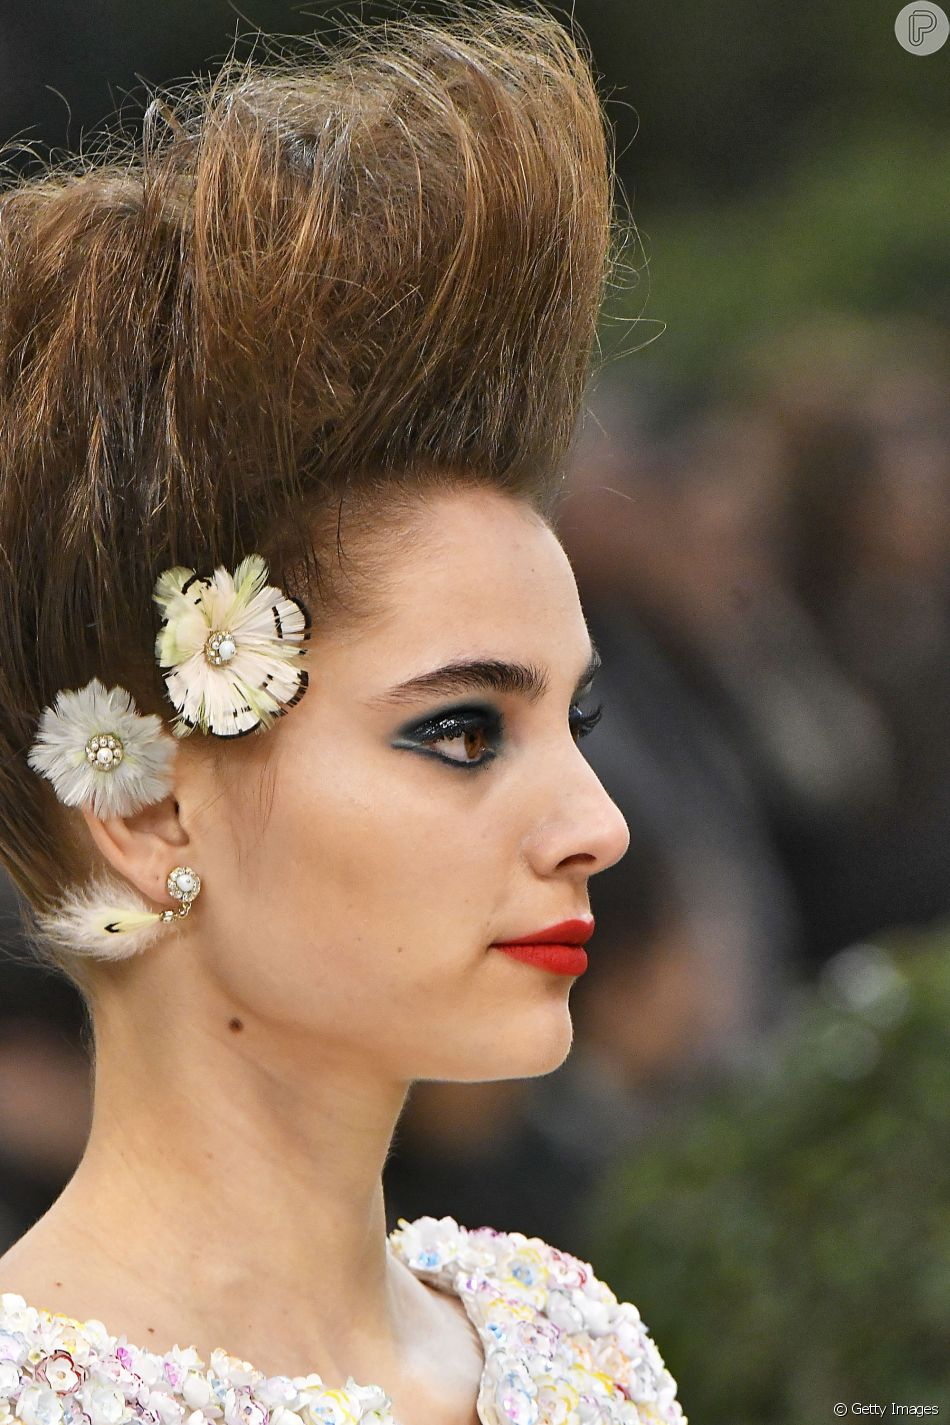 Carnaval chic: Cabelos pro alto + flores na Chanel